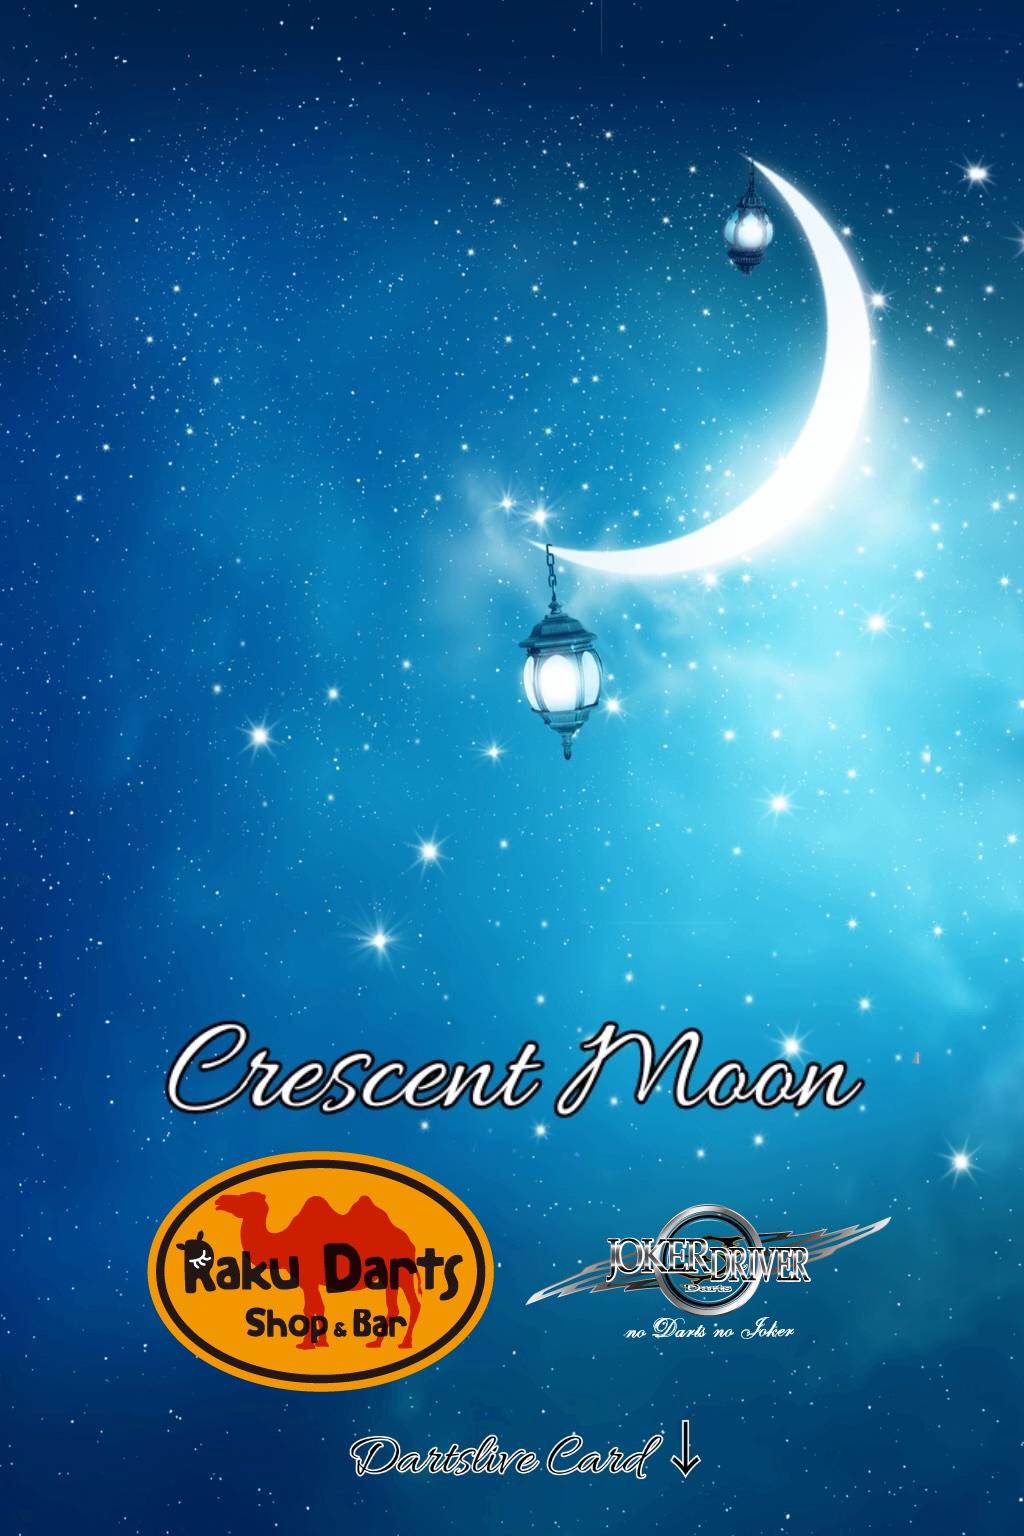 JOKERDRIVER(ジョーカードライバー) [バレル] CRYSTAL(クリスタル) -  Crescent Moon(クレッセントムーン) 2BA